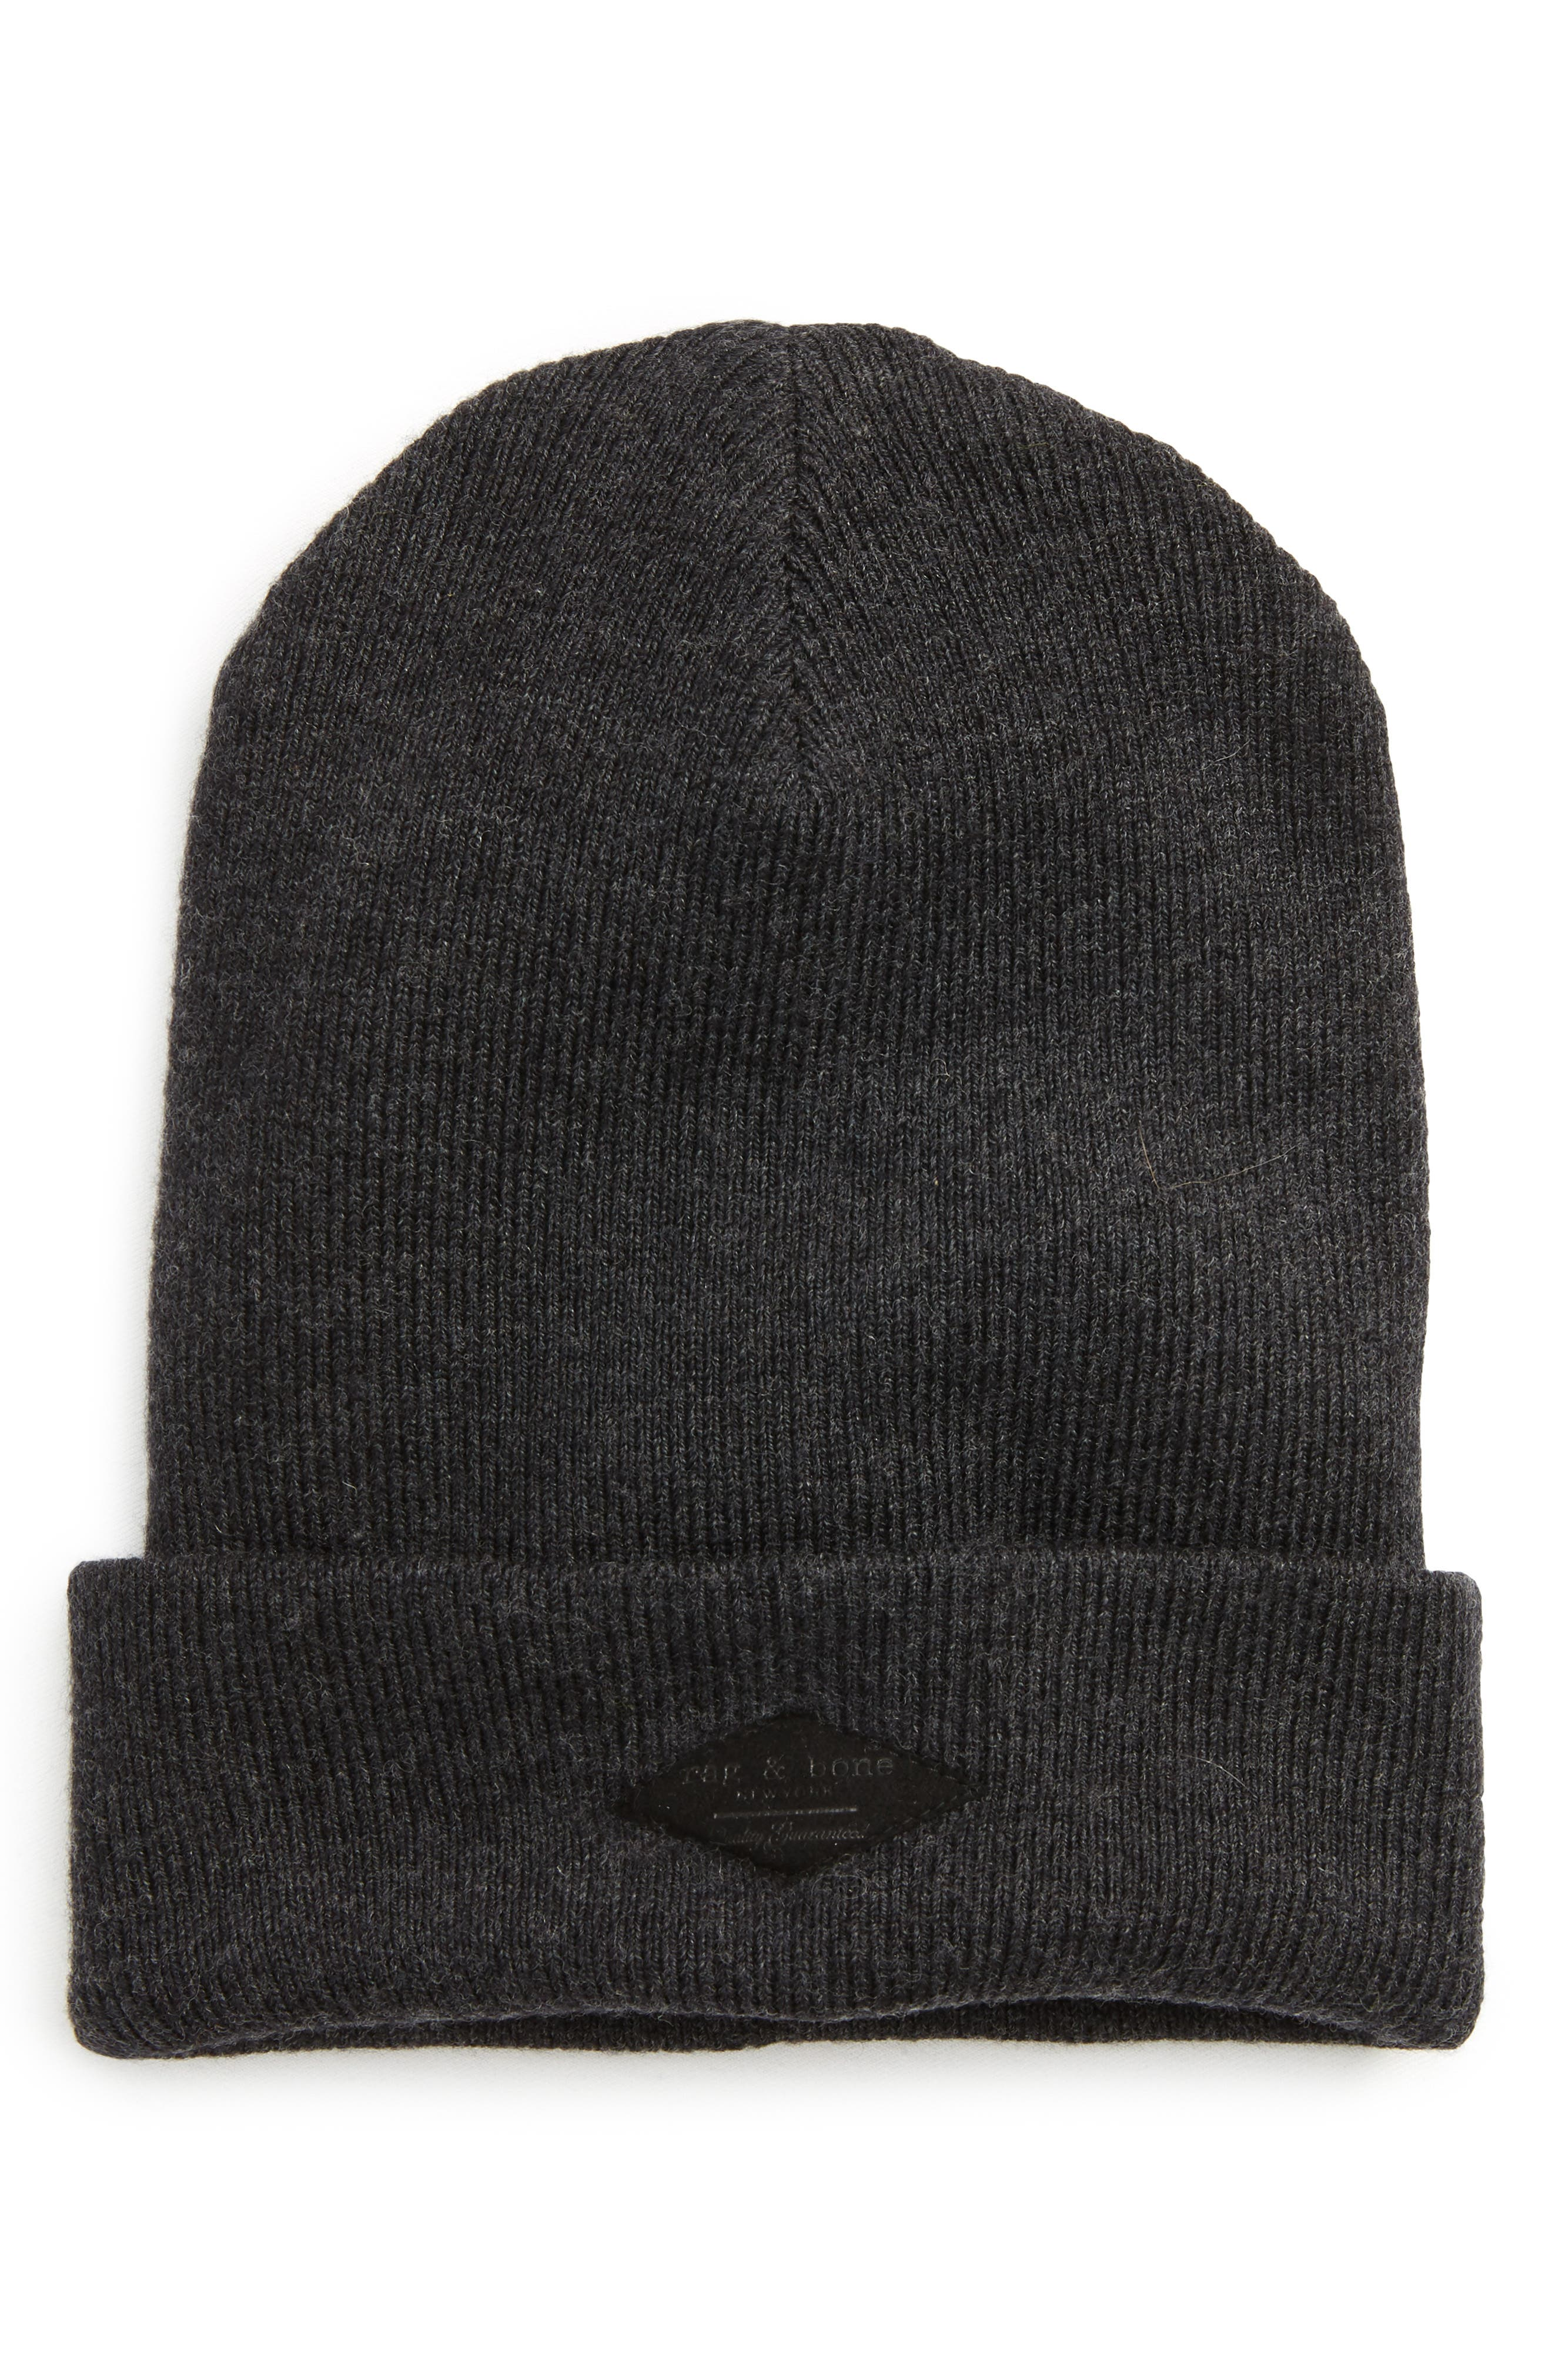 rag & bone Addison Stretch Merino Wool Knit Cap